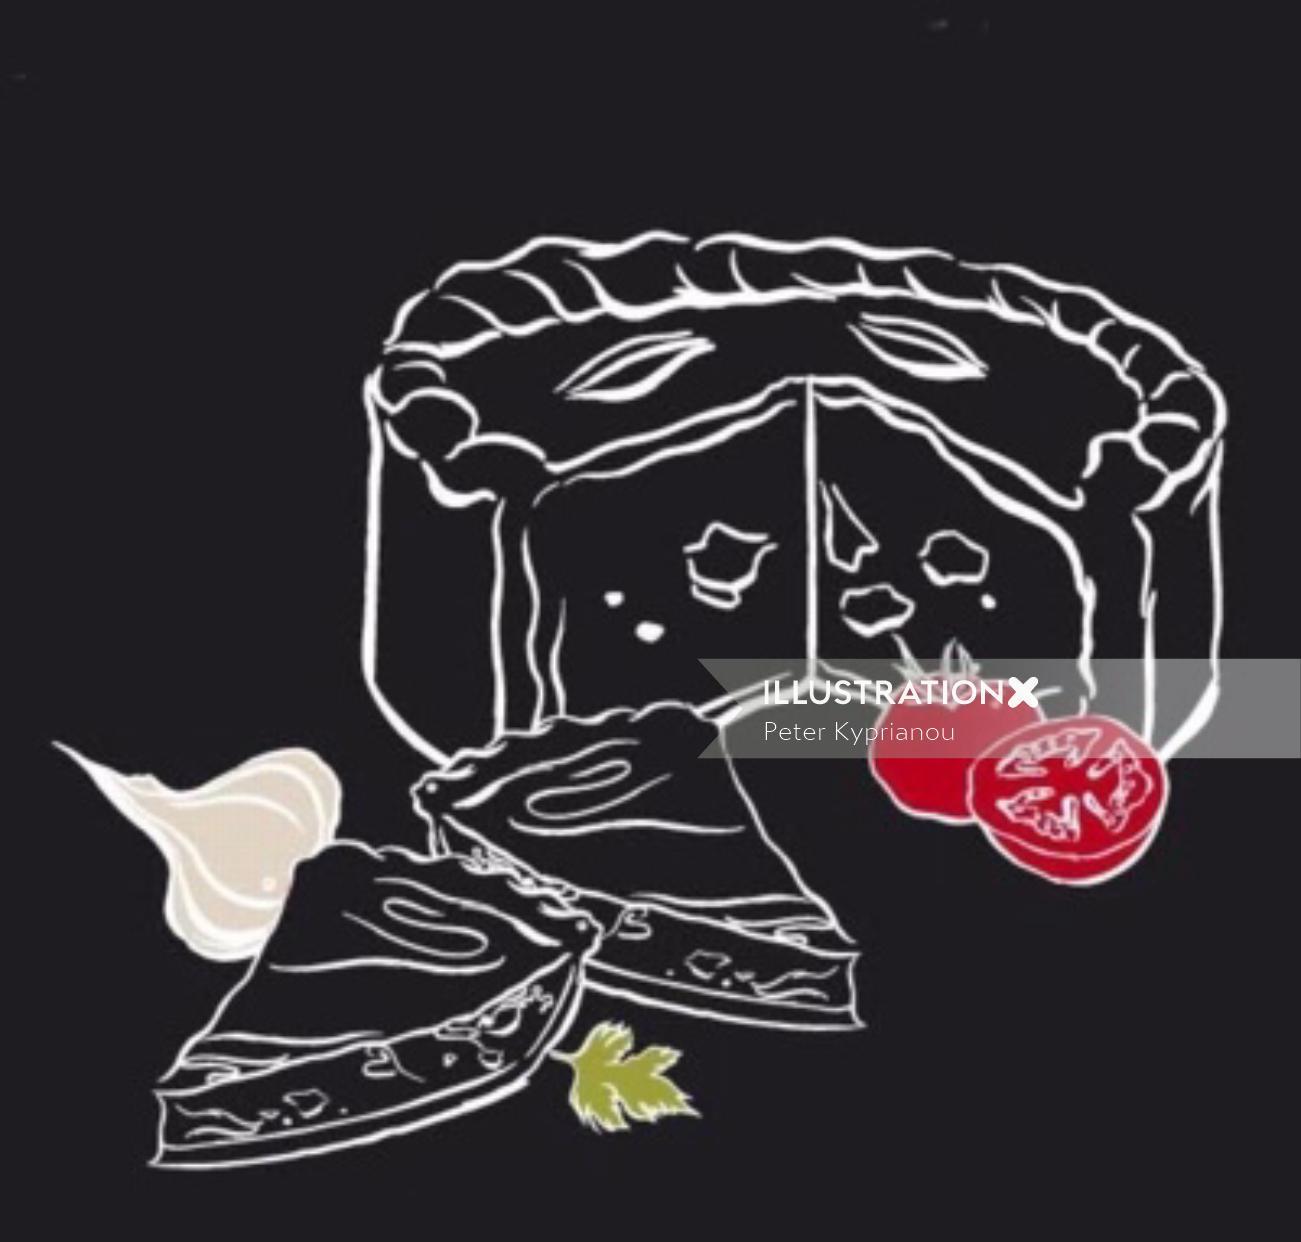 Line art of Sliced cake and vegetables